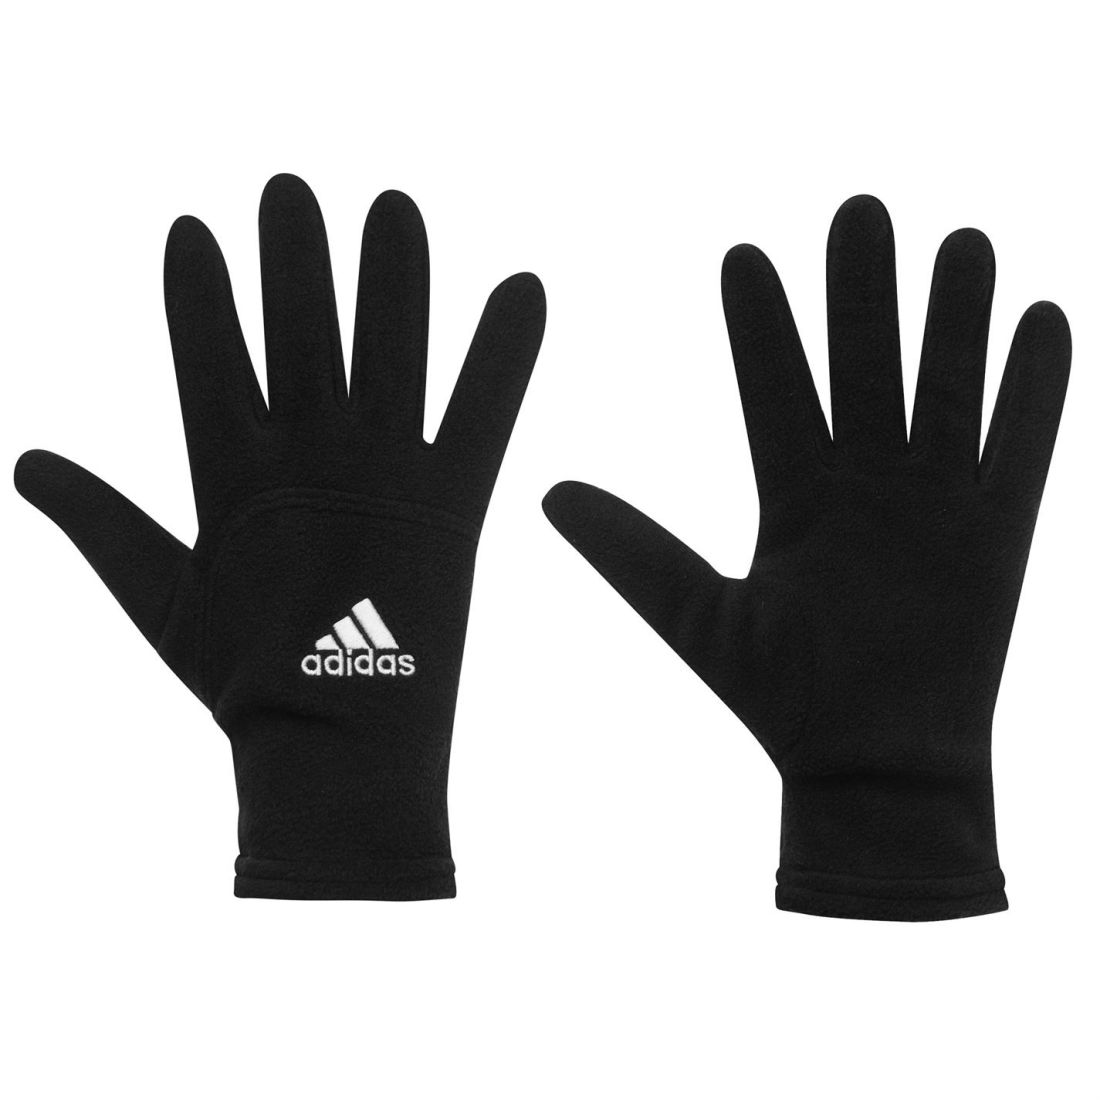 Adidas Mens Gents Fleece Gloves Winter Warm Workout